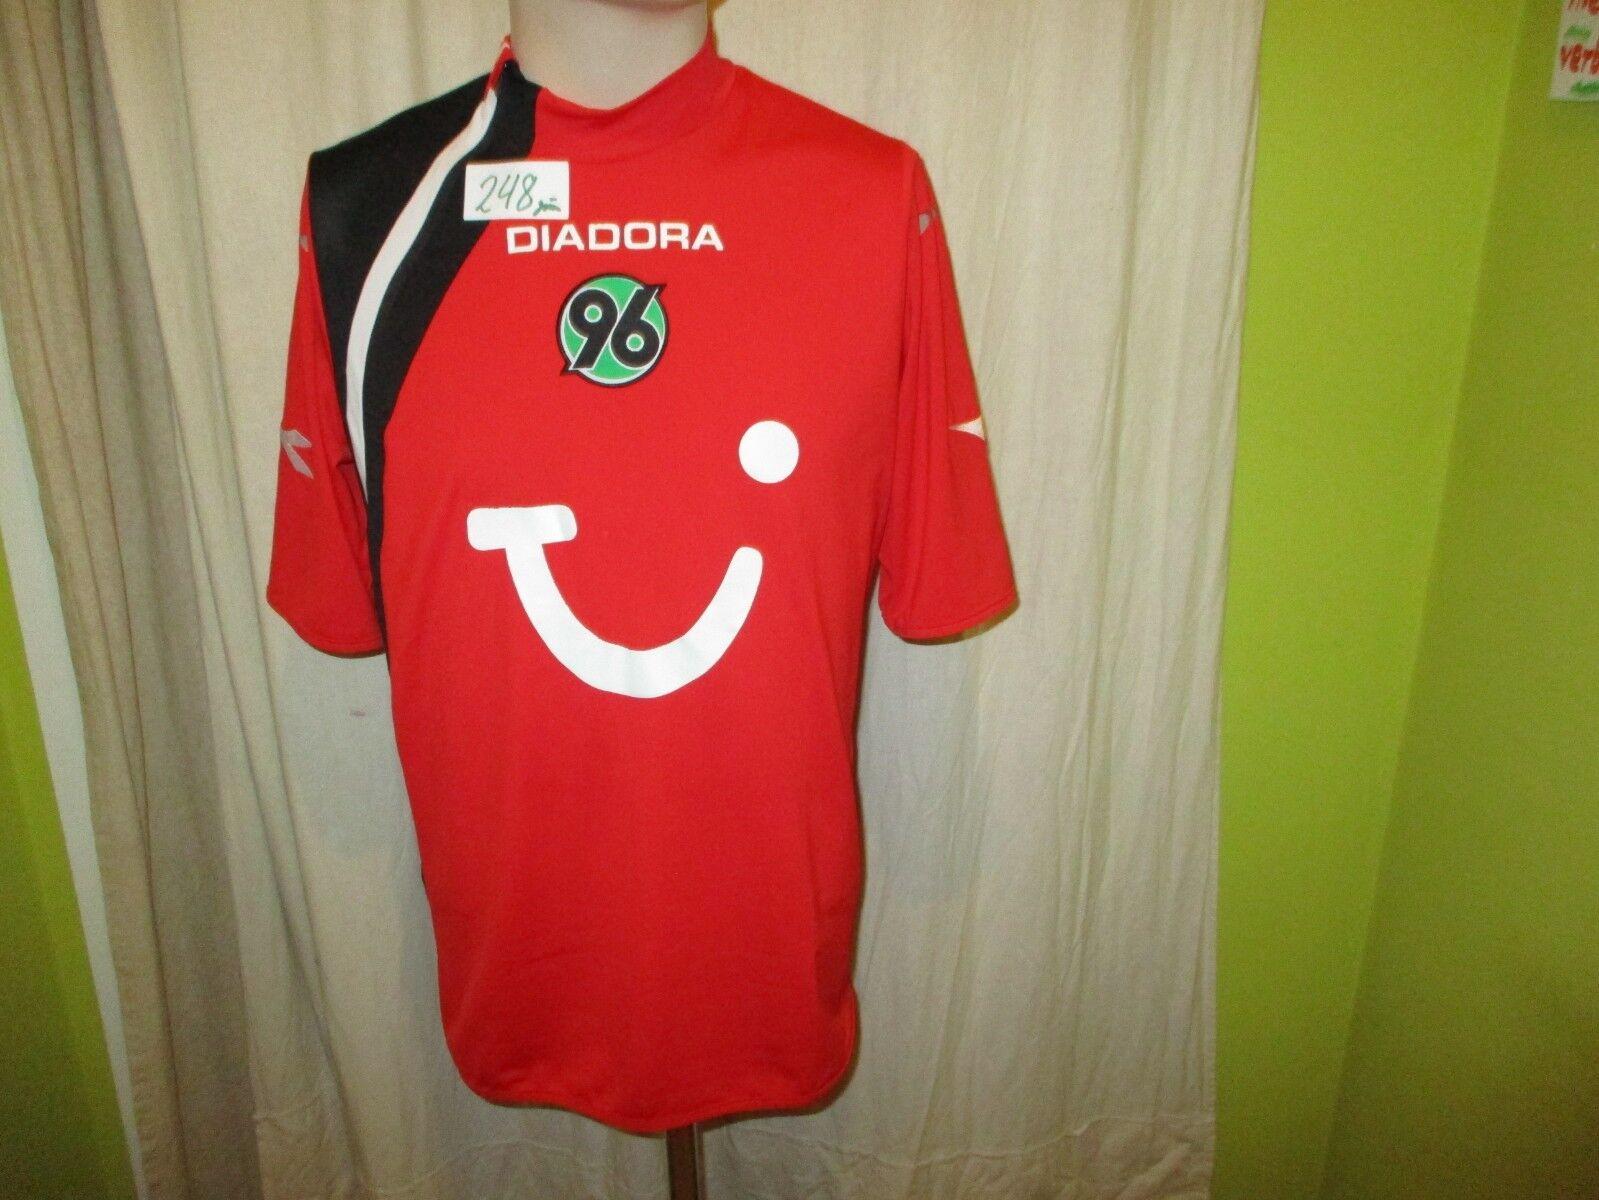 Hannover 96 Original Diadora Heim Heim Heim Trikot 2005 06  TUI  Gr.M- L TOP 202516